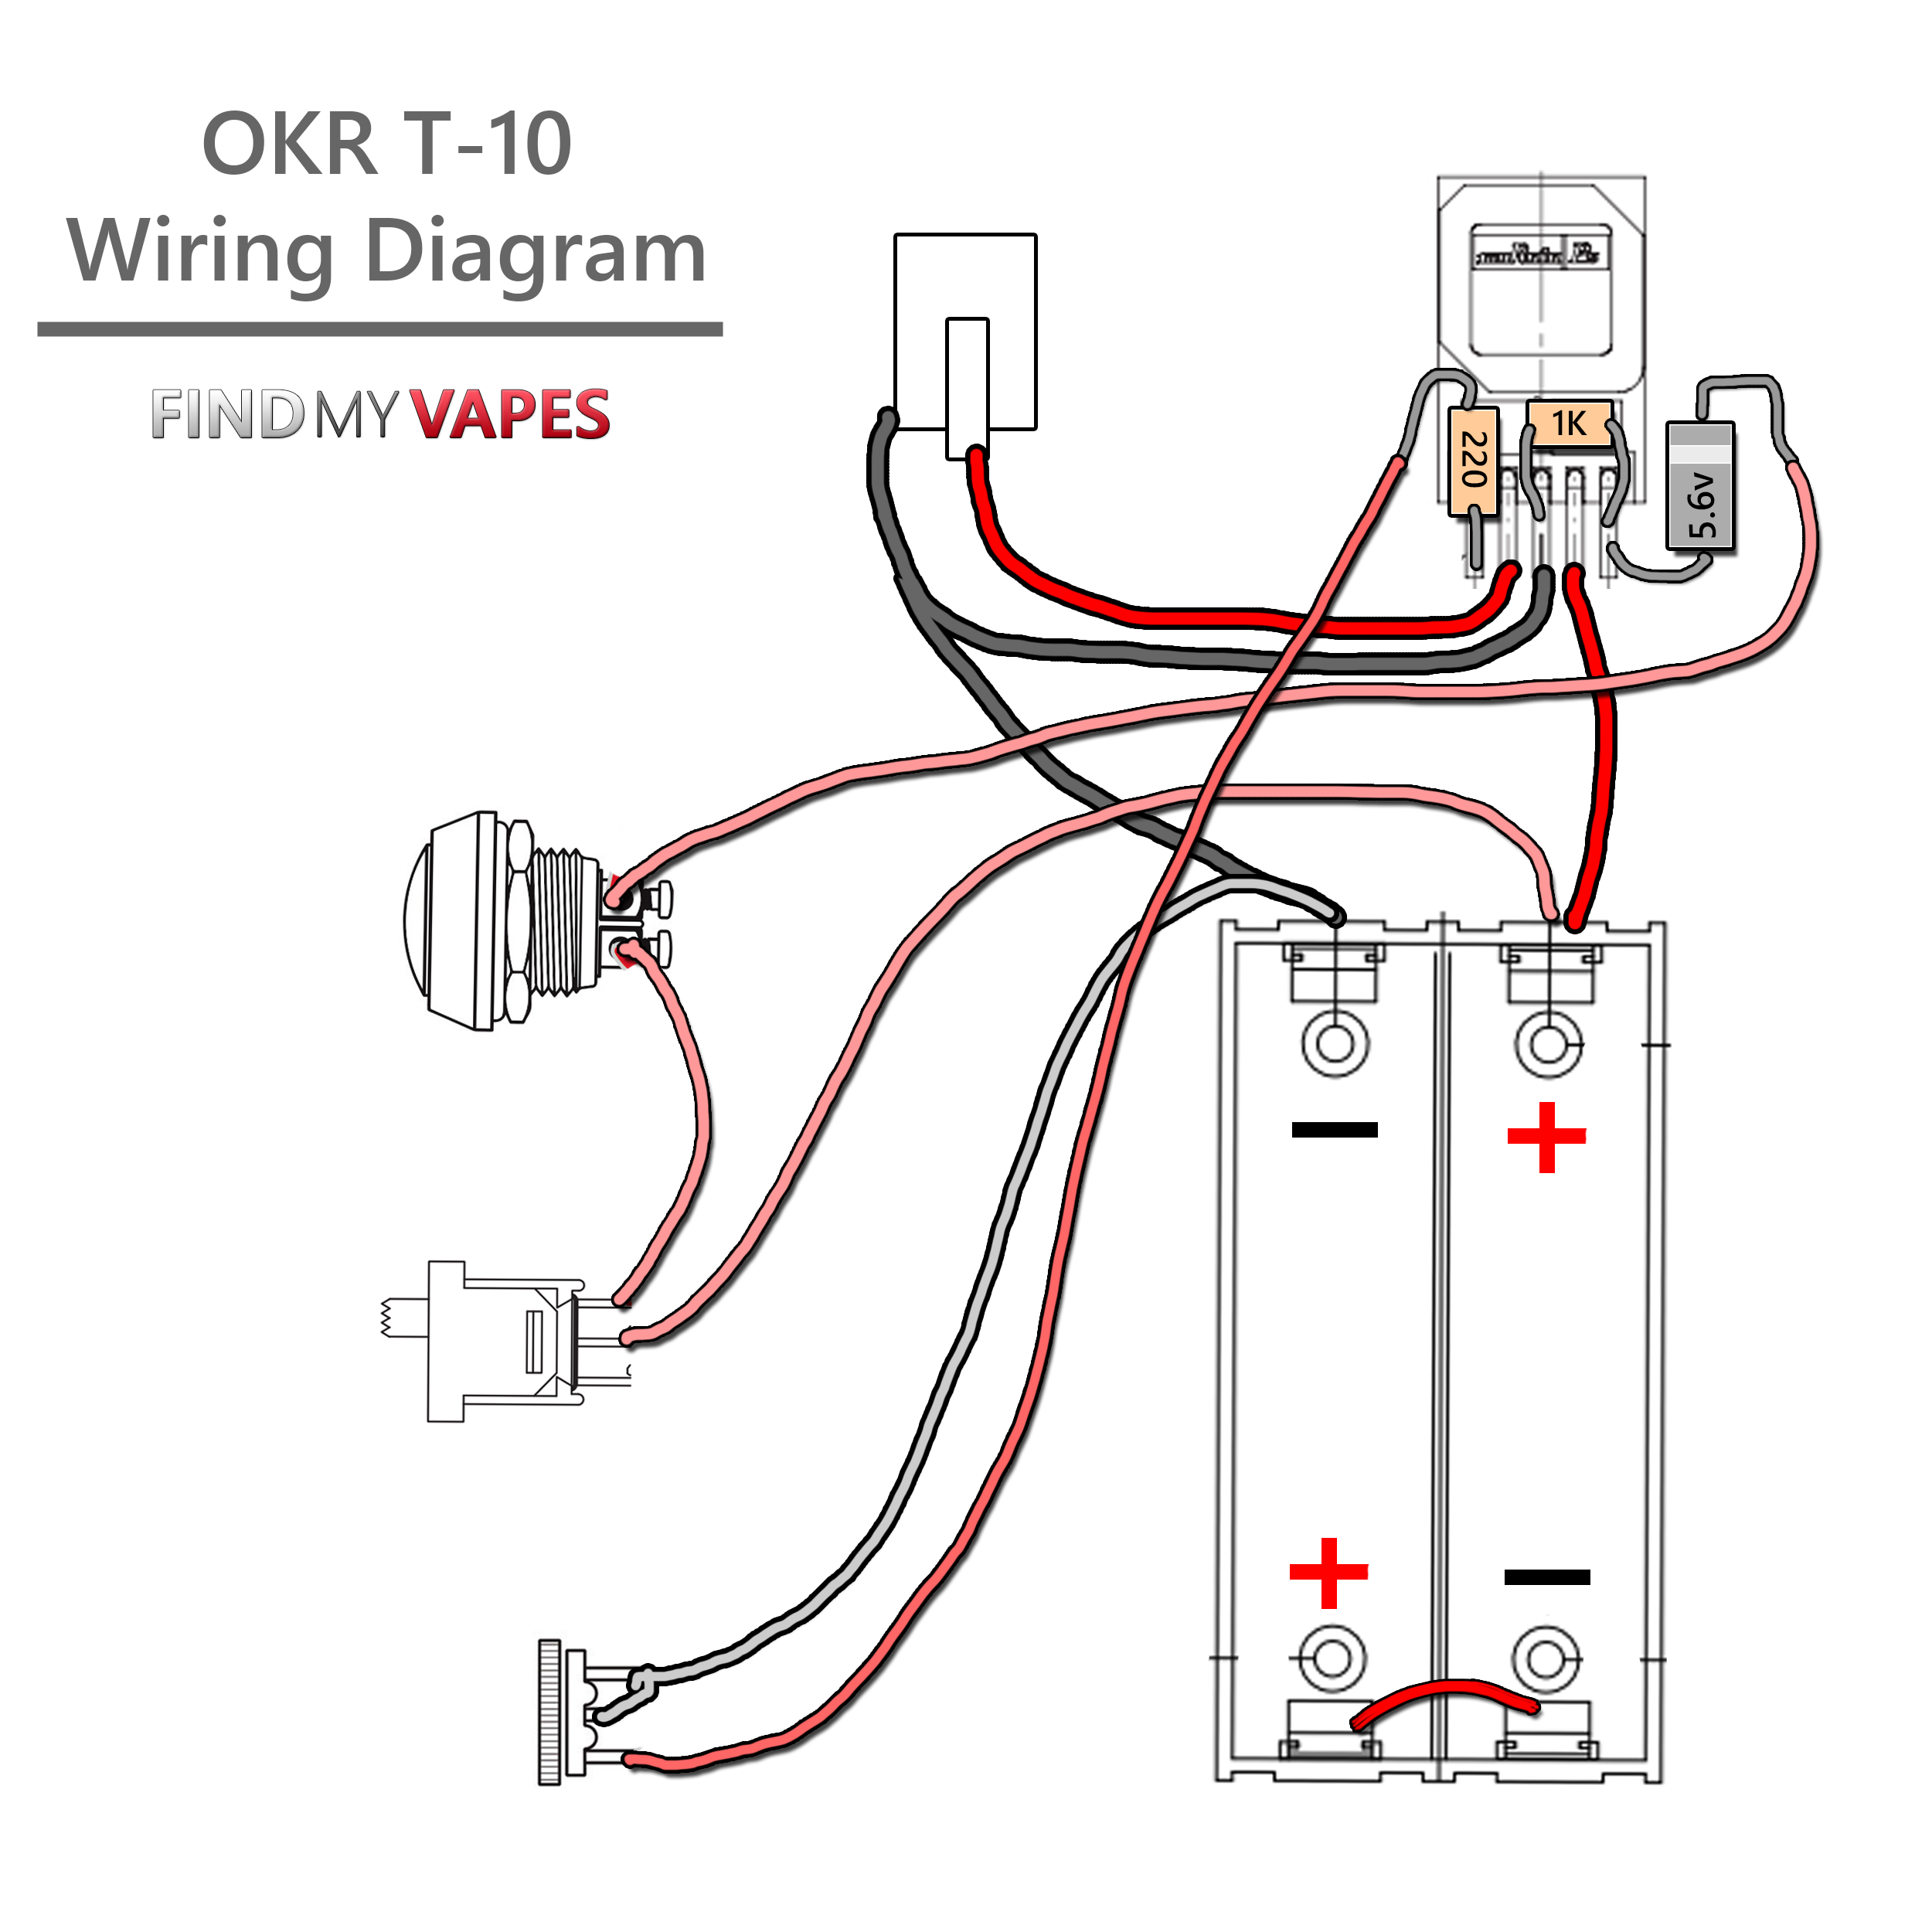 How to Build an OKR Box Mod Tutorial Vape mods box, Box